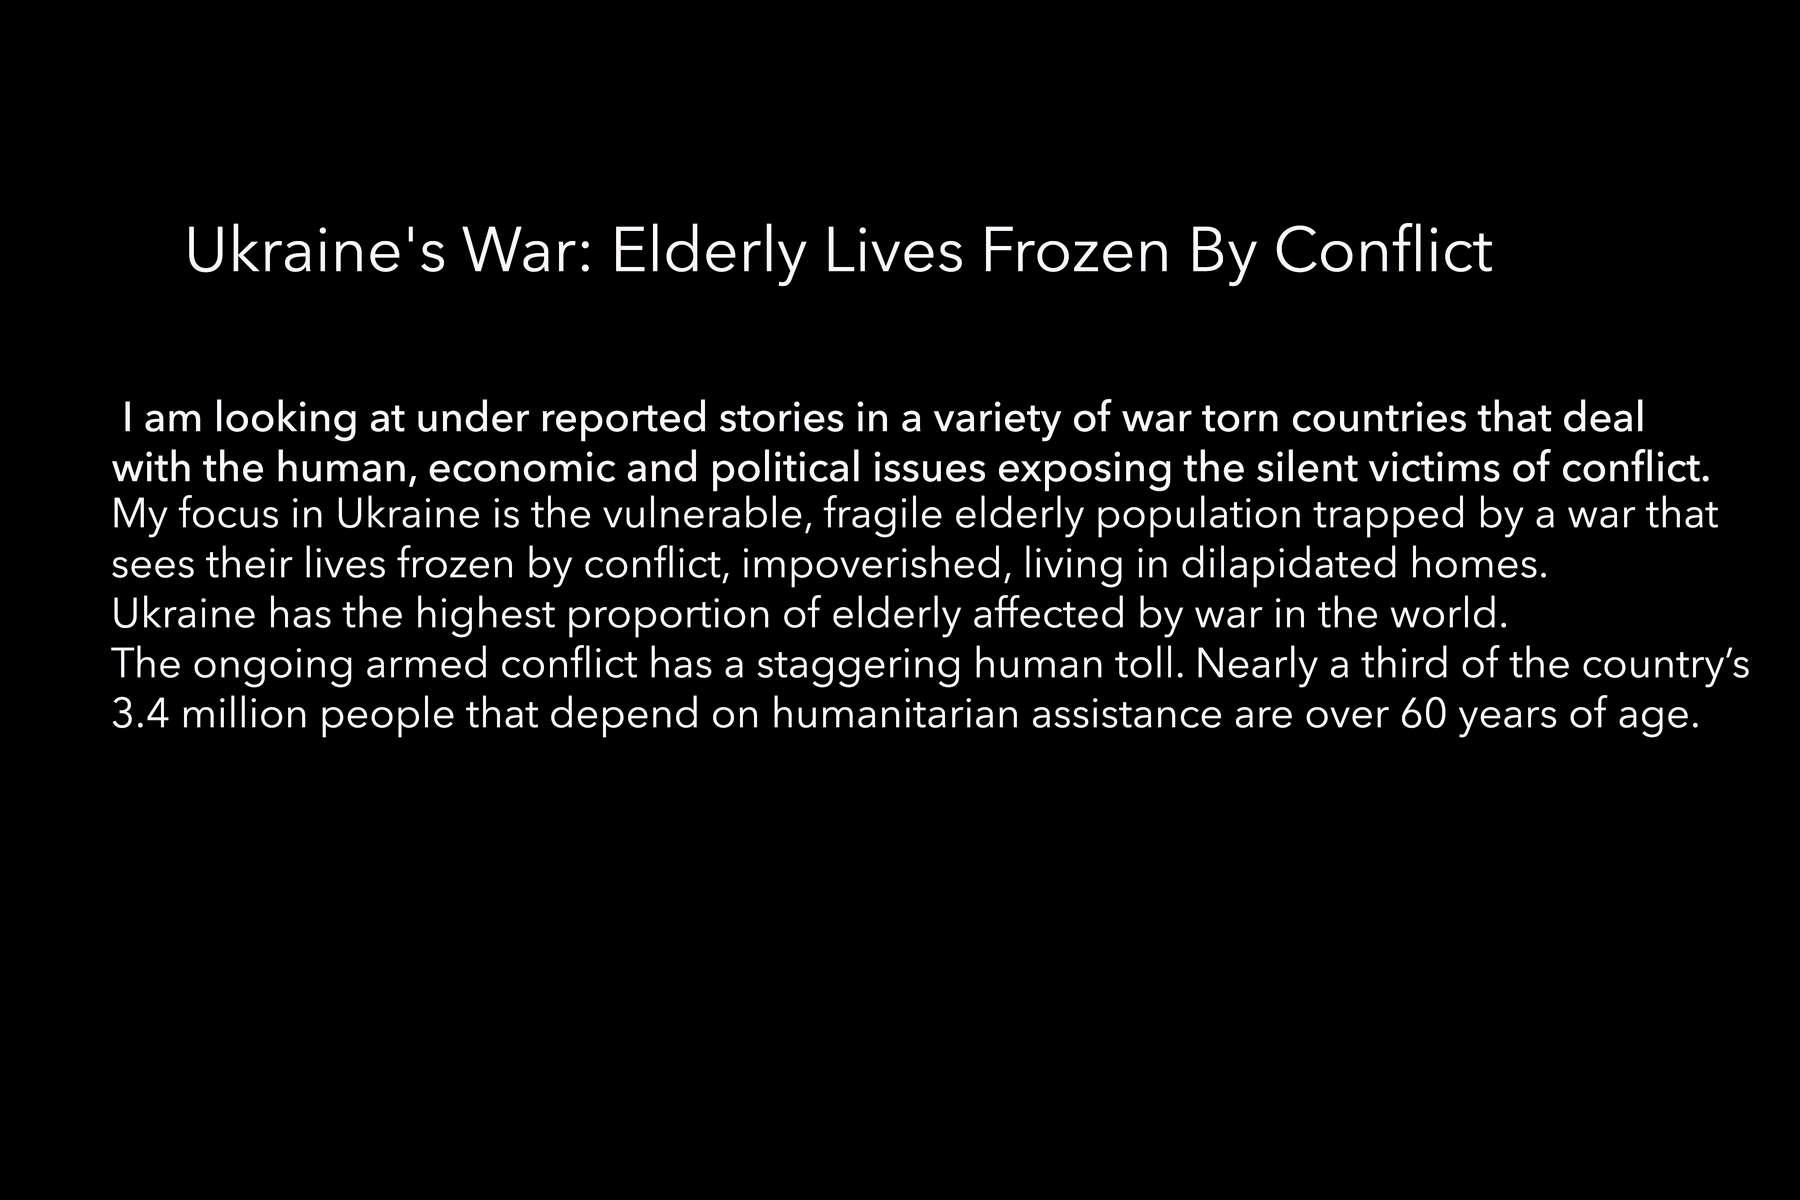 TITLE_UKRAINE